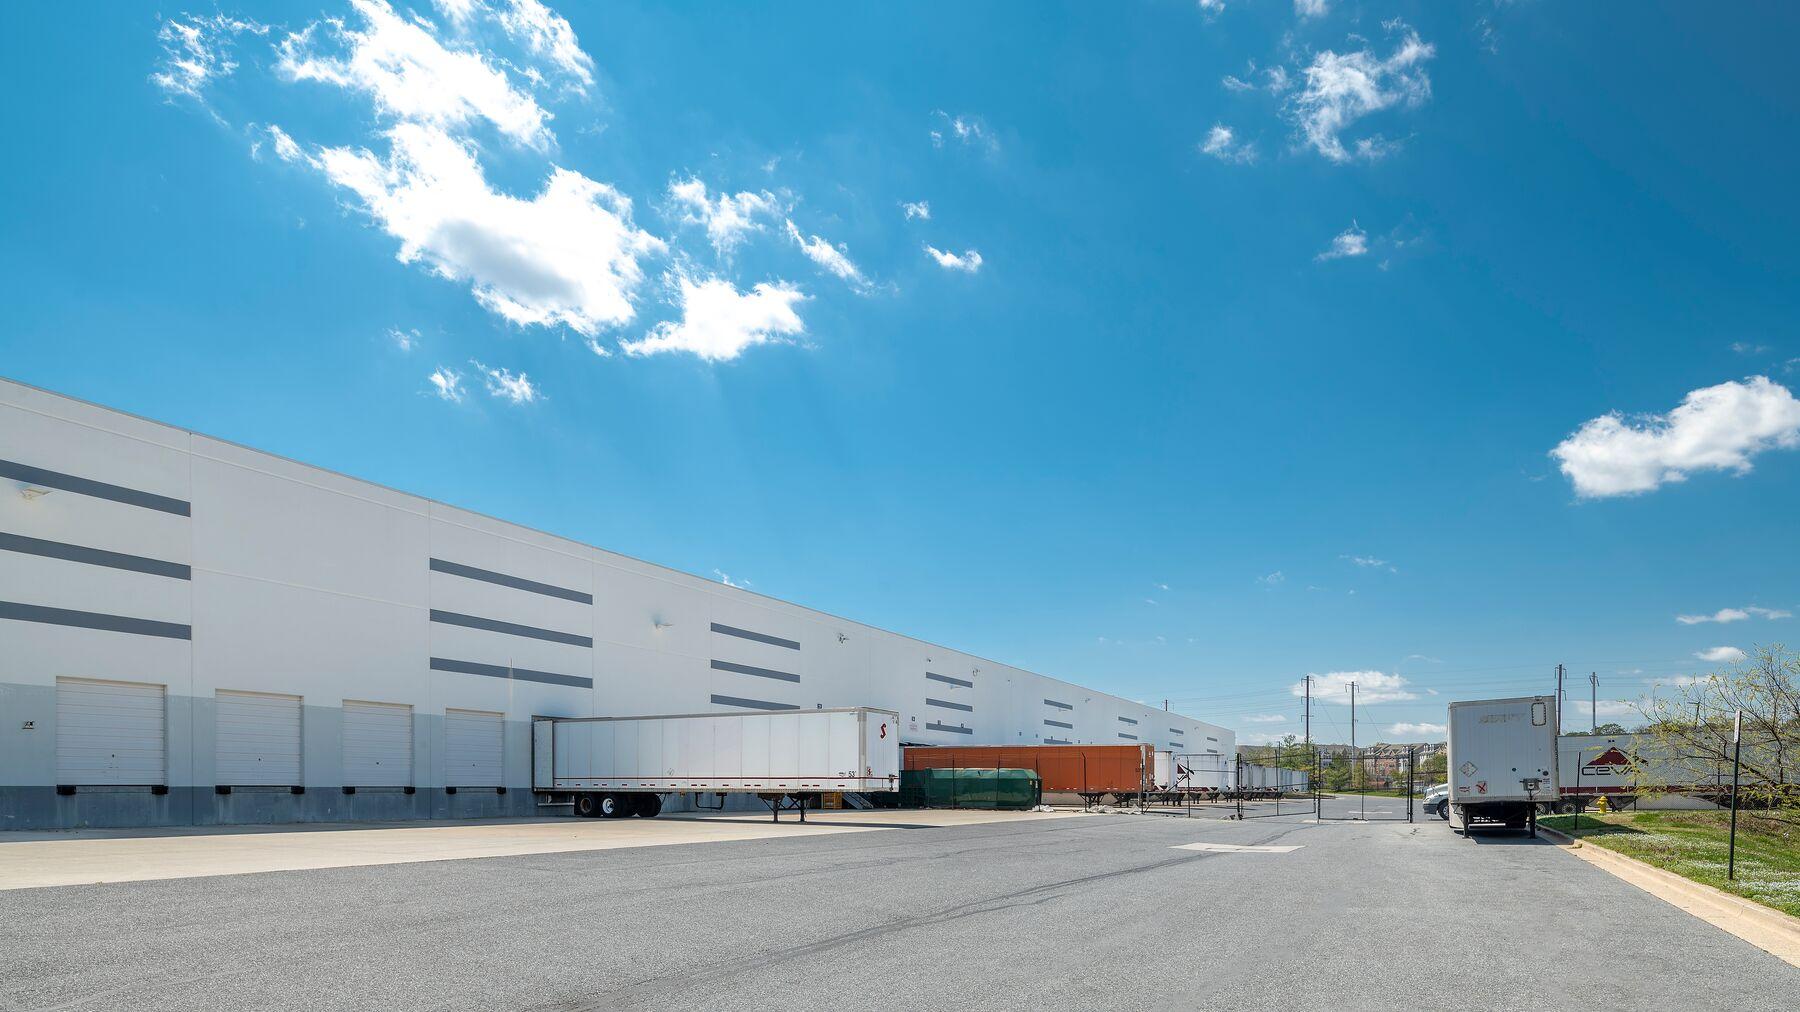 DPM-Arundel-Distribution-Center-2_-2.jpg